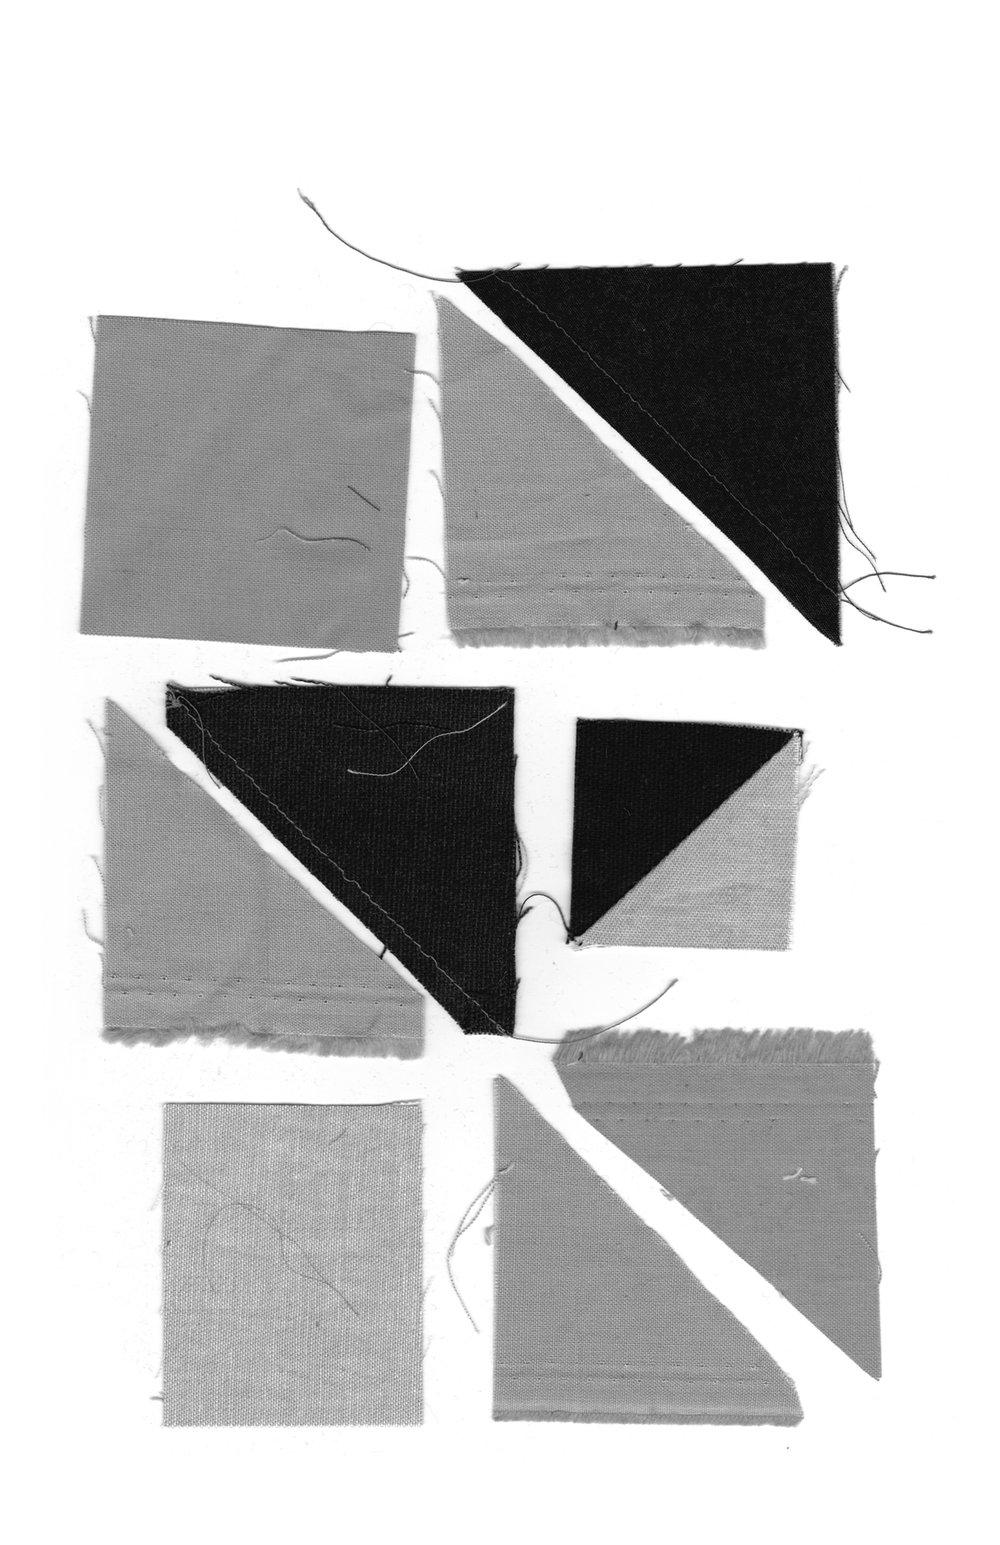 scraps_page13.jpg